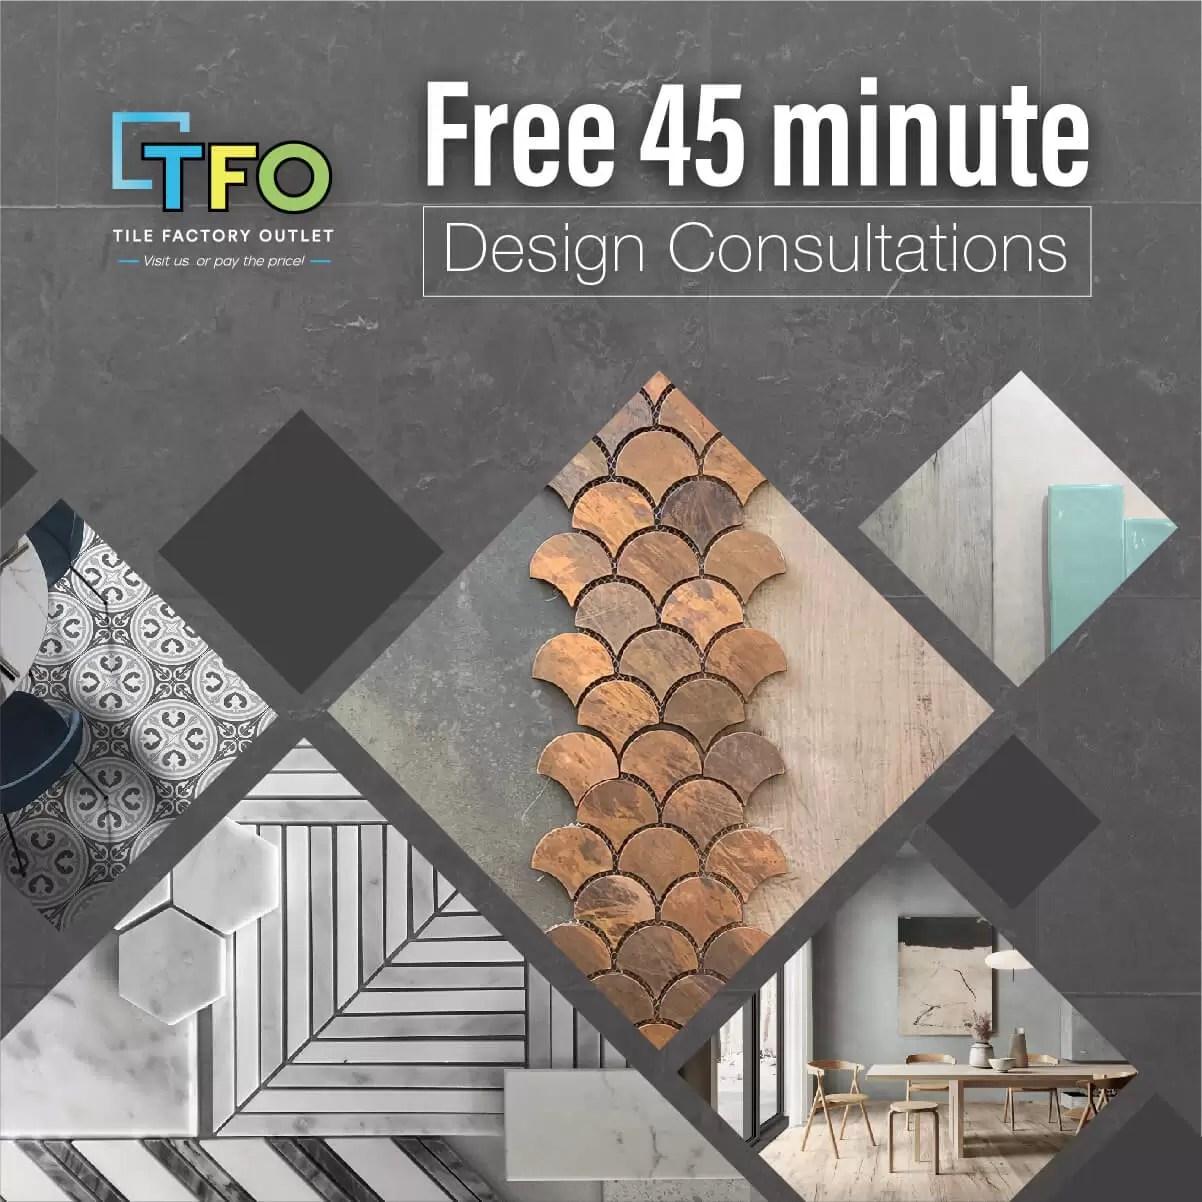 visit tile factory outlet